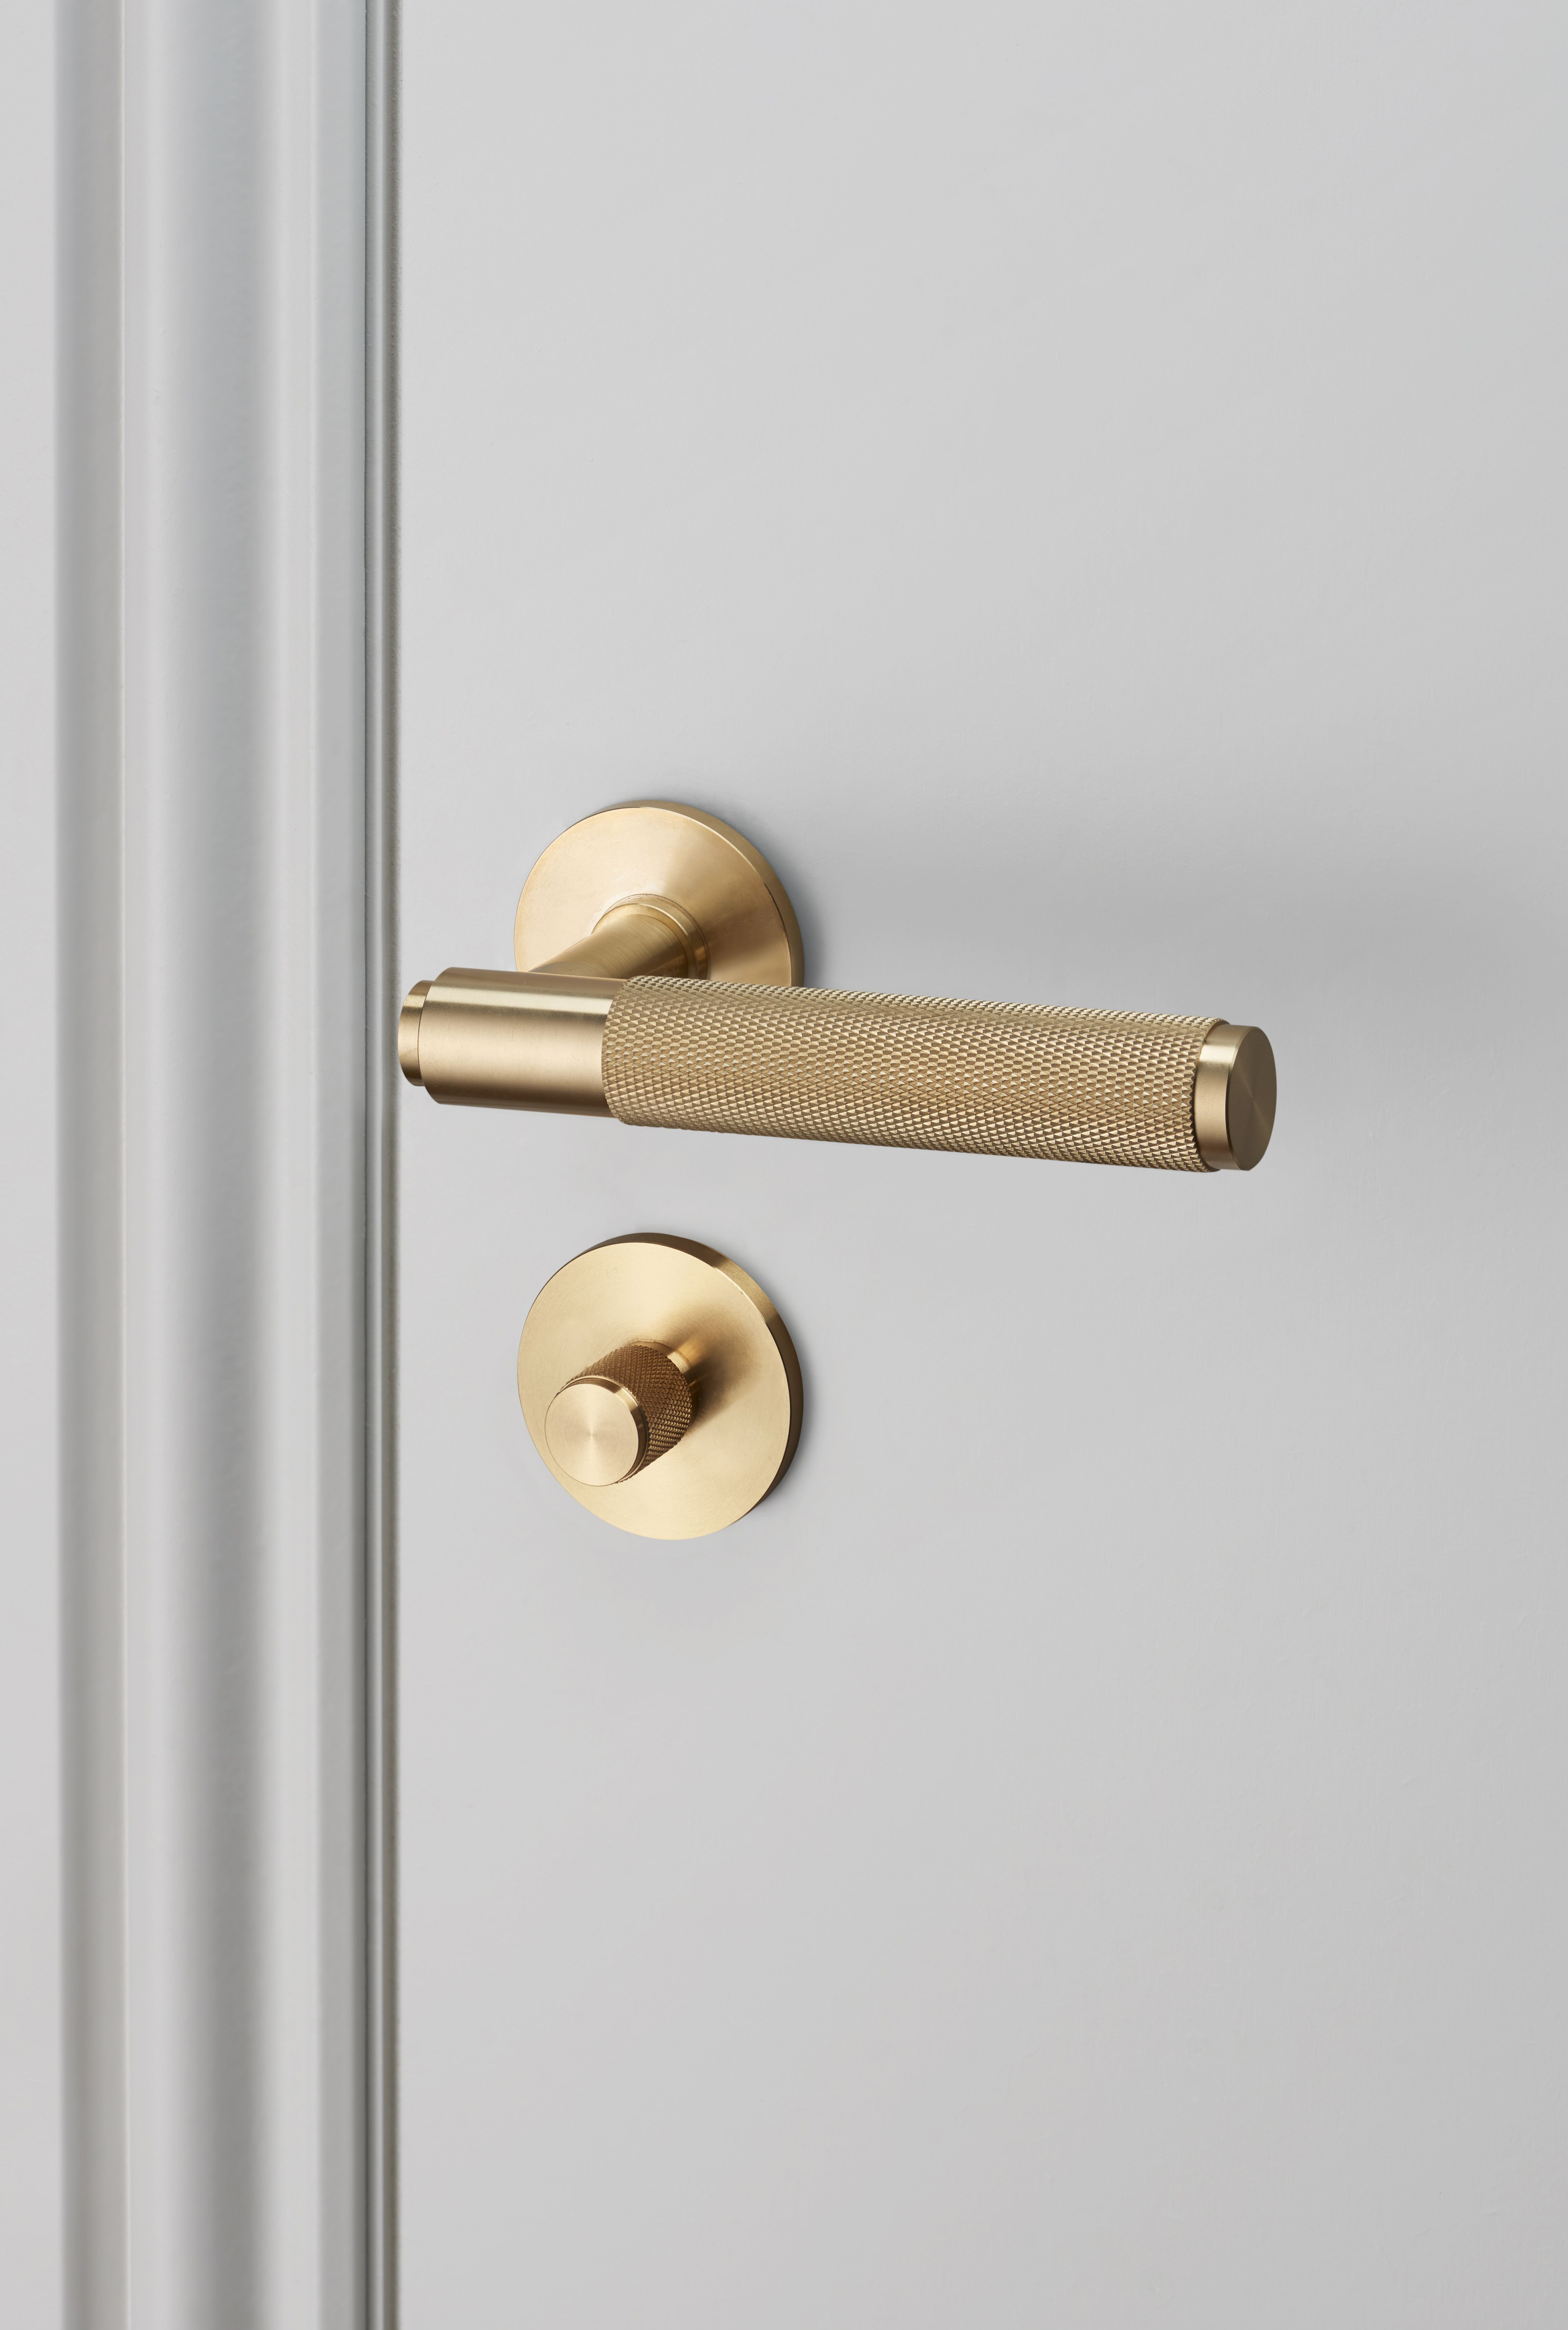 Fresh Bathroom Privacy Door Handles Check More At Https Homefurnitureone Com Bathroom Privacy D Door Handles Interior Bedroom Door Handles Brass Door Handles